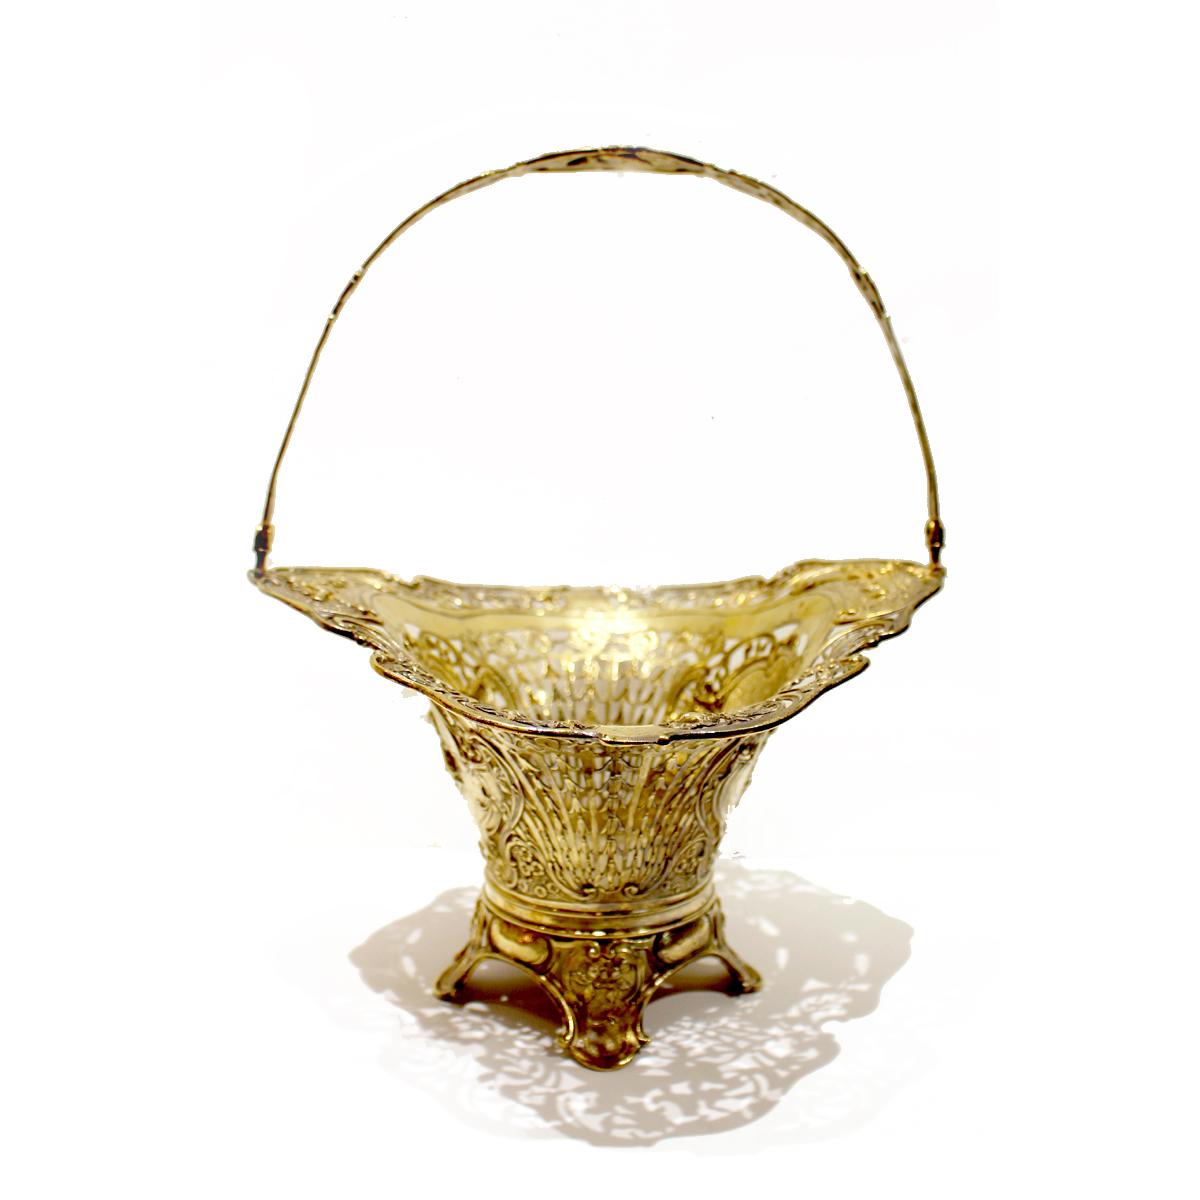 German Gilt Silver 'Bride's' Basket, Mid 19th Century